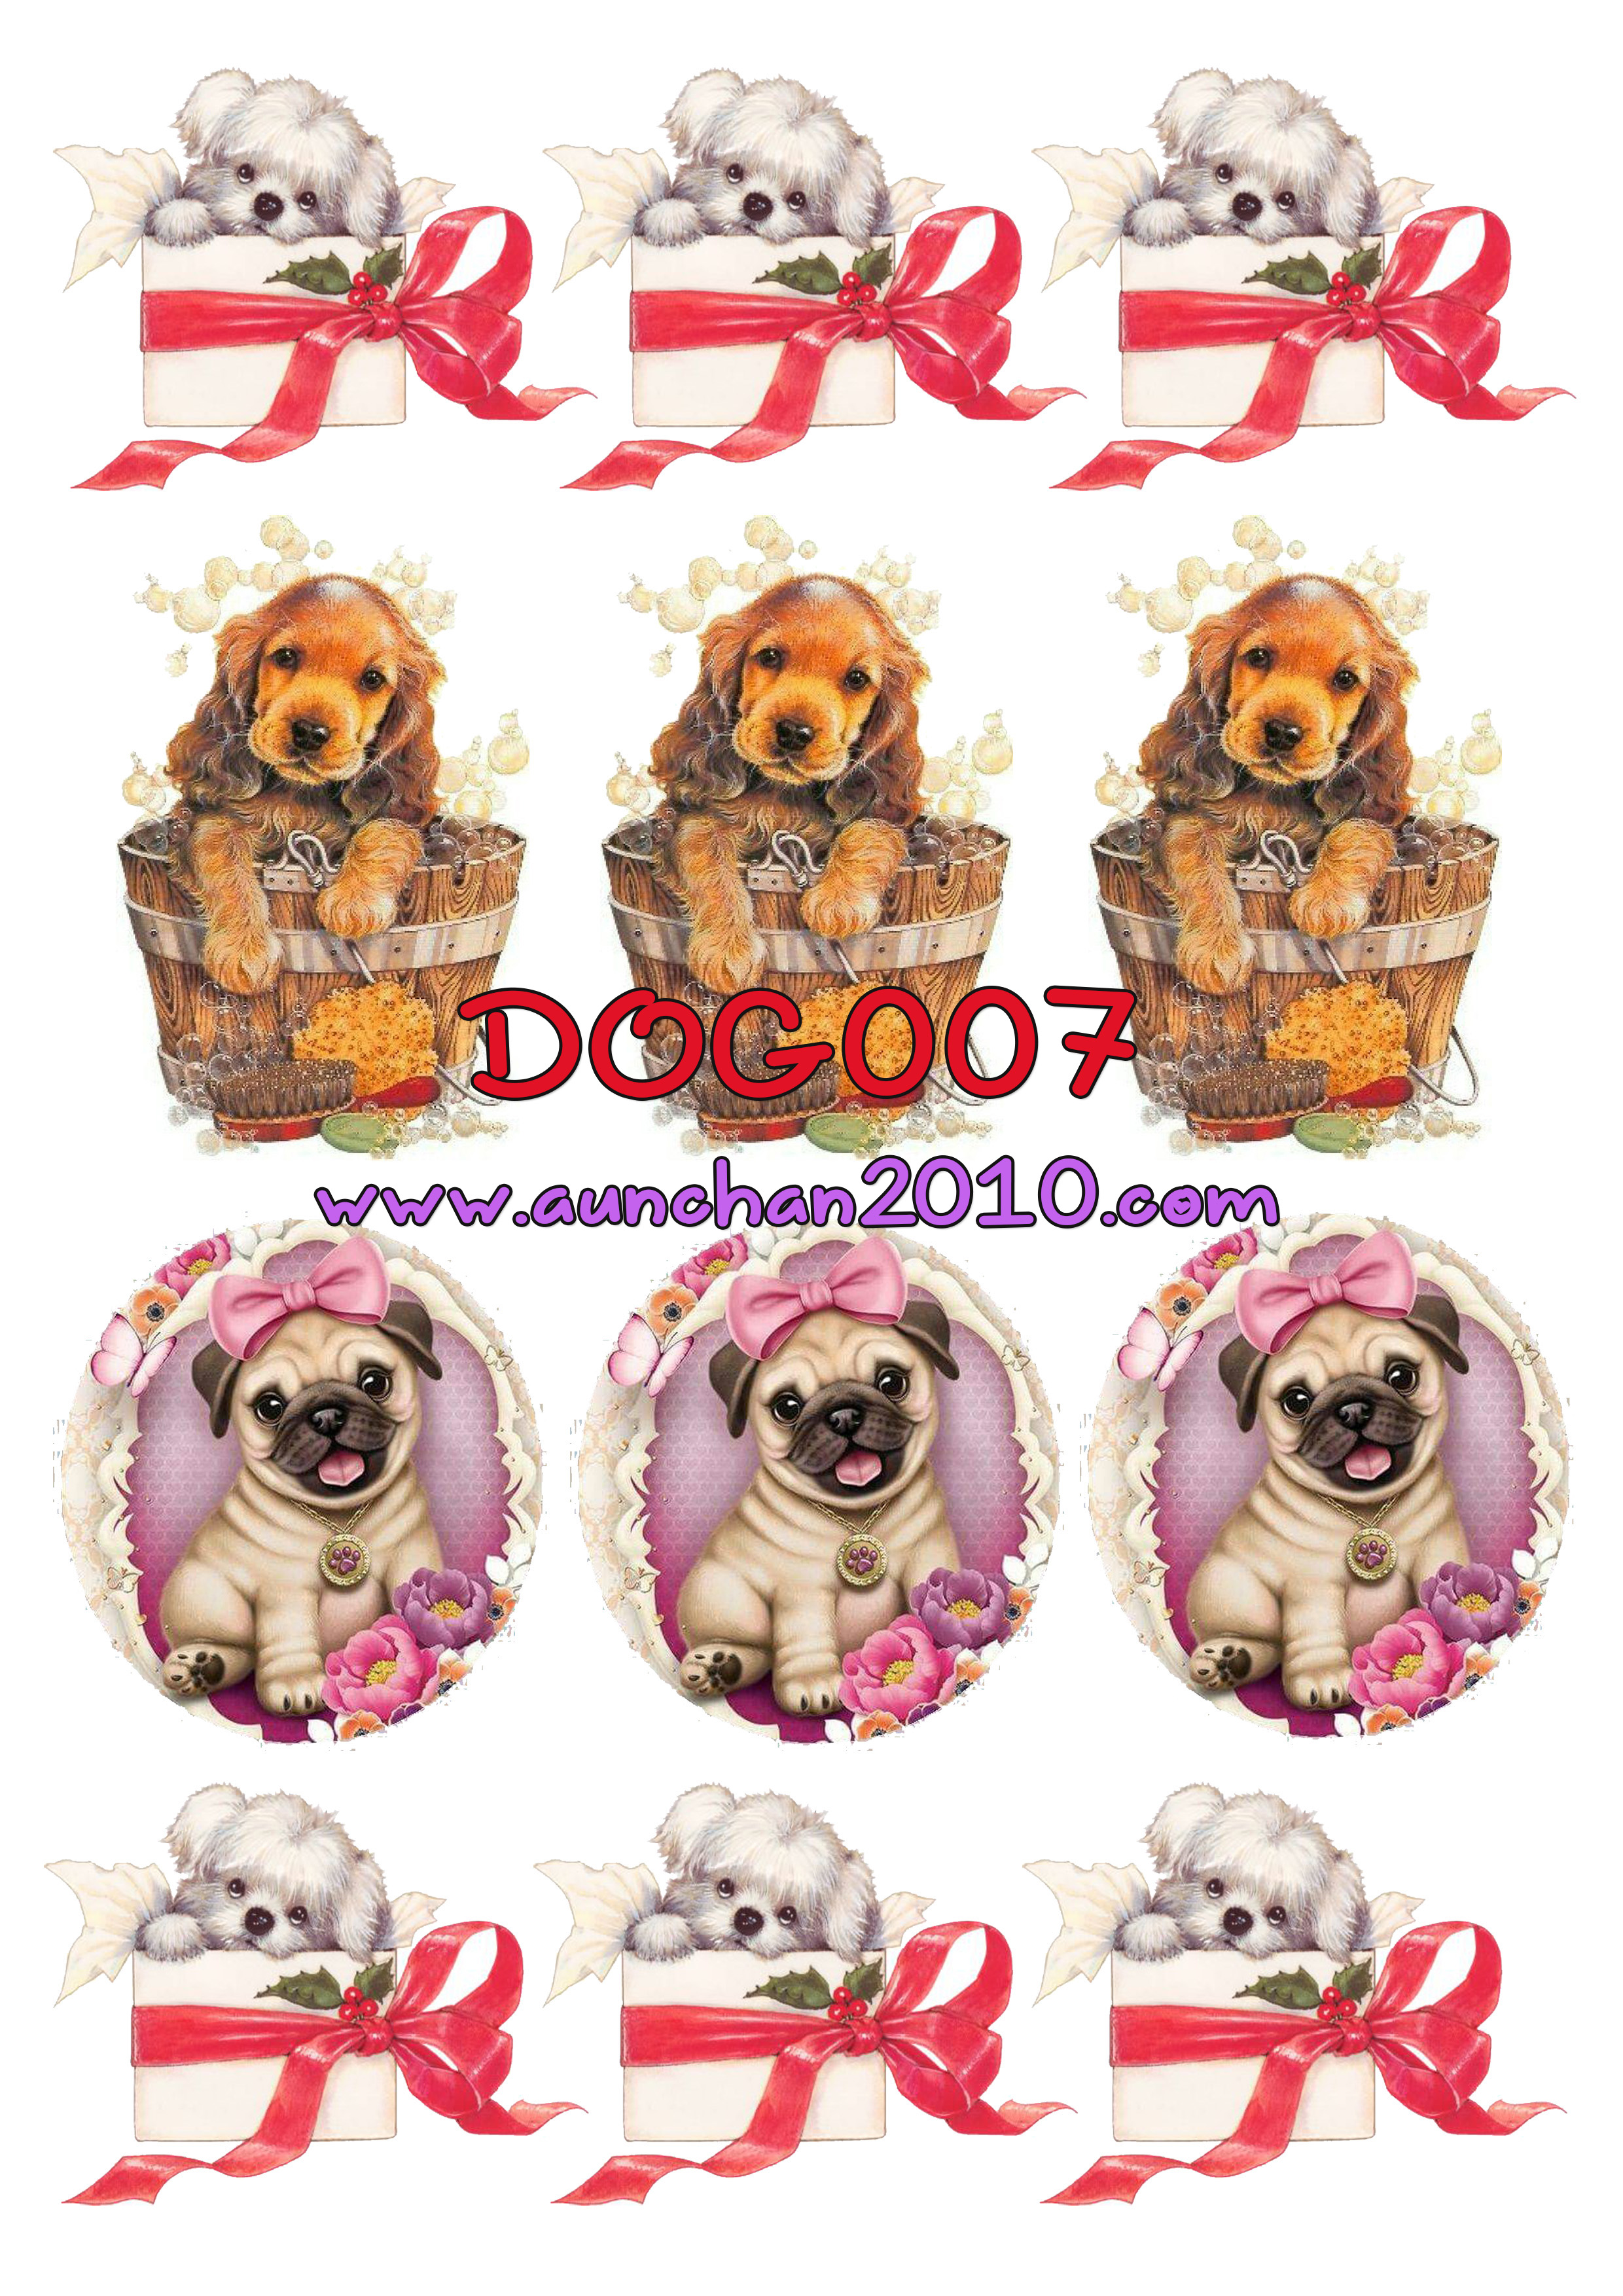 DOG007 กระดาษแนพกิ้น 21x30ซม. ลายสุนัข